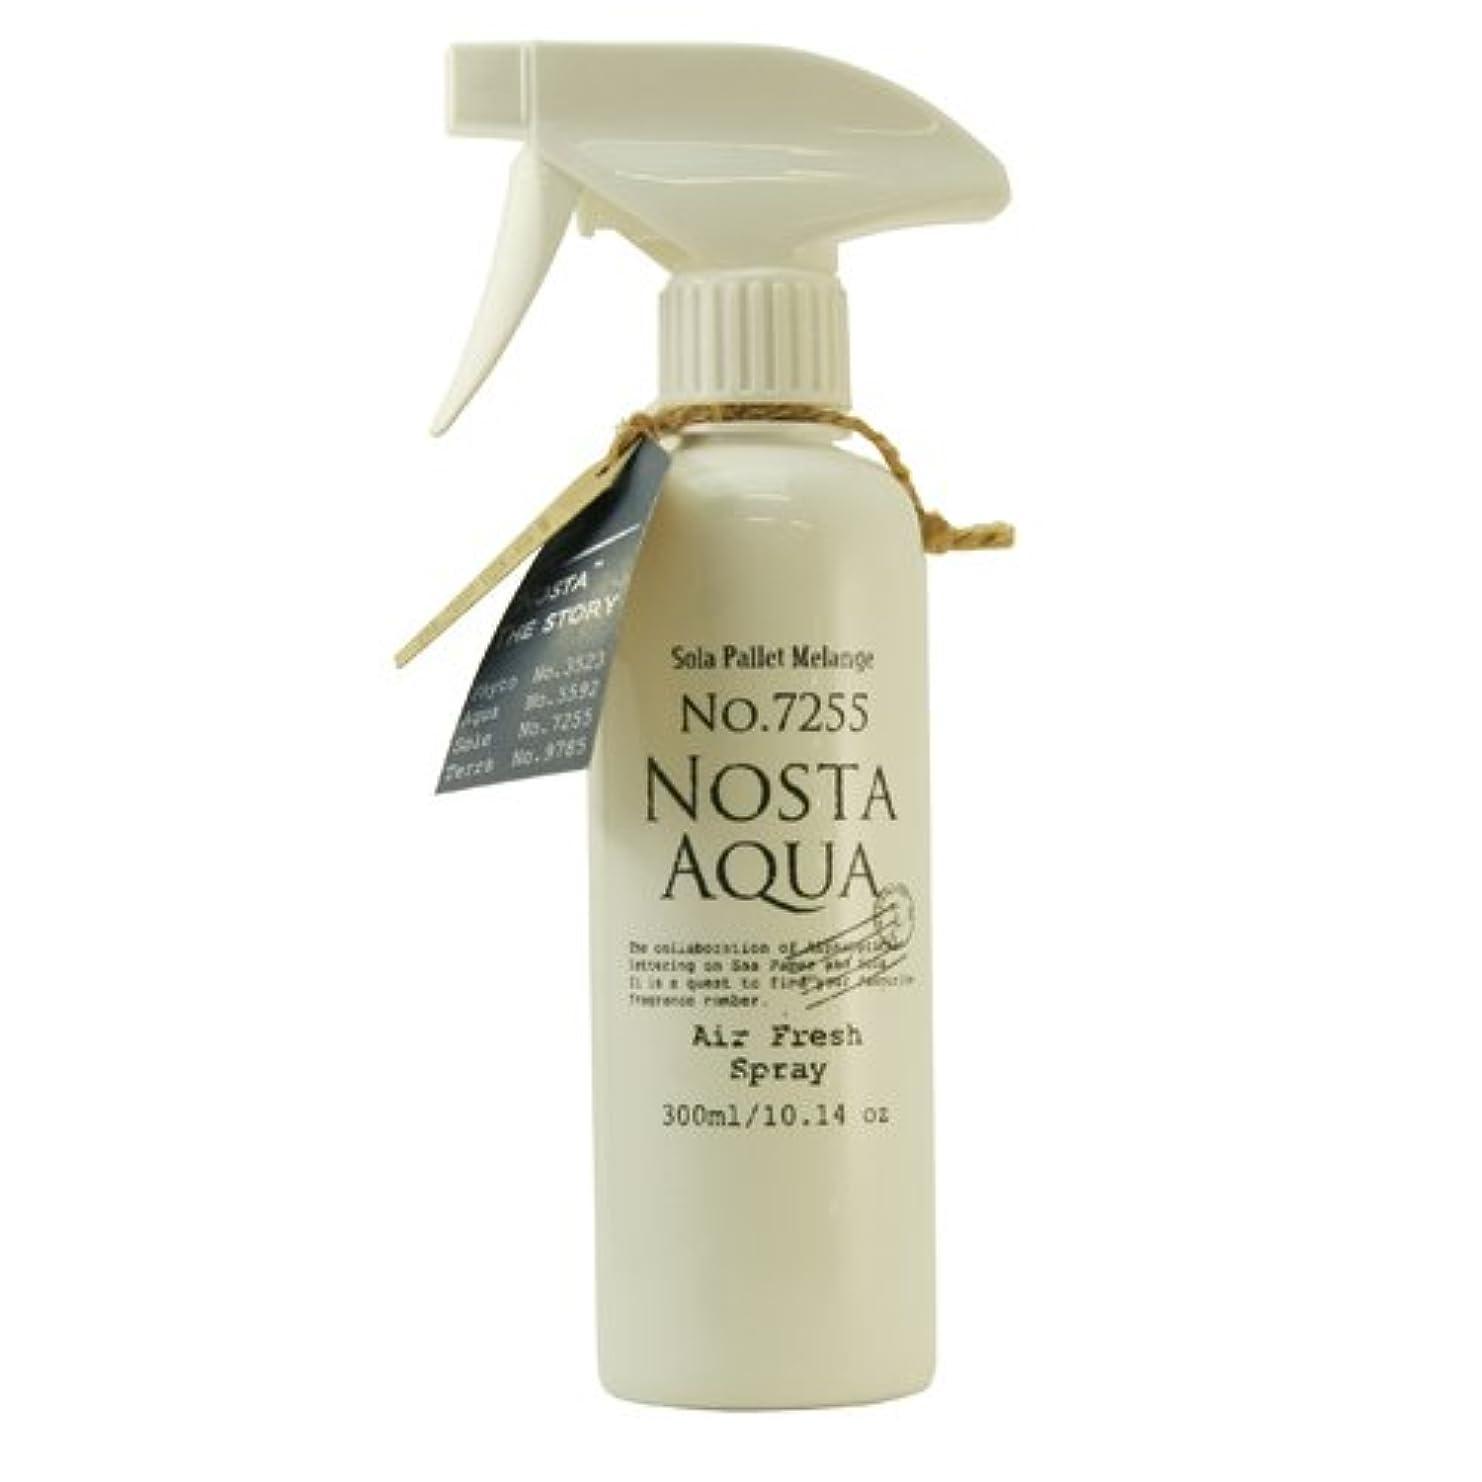 Nosta ノスタ Air Fresh Spray エアーフレッシュスプレー(ルームスプレー)Aqua アクア / 生命の起源